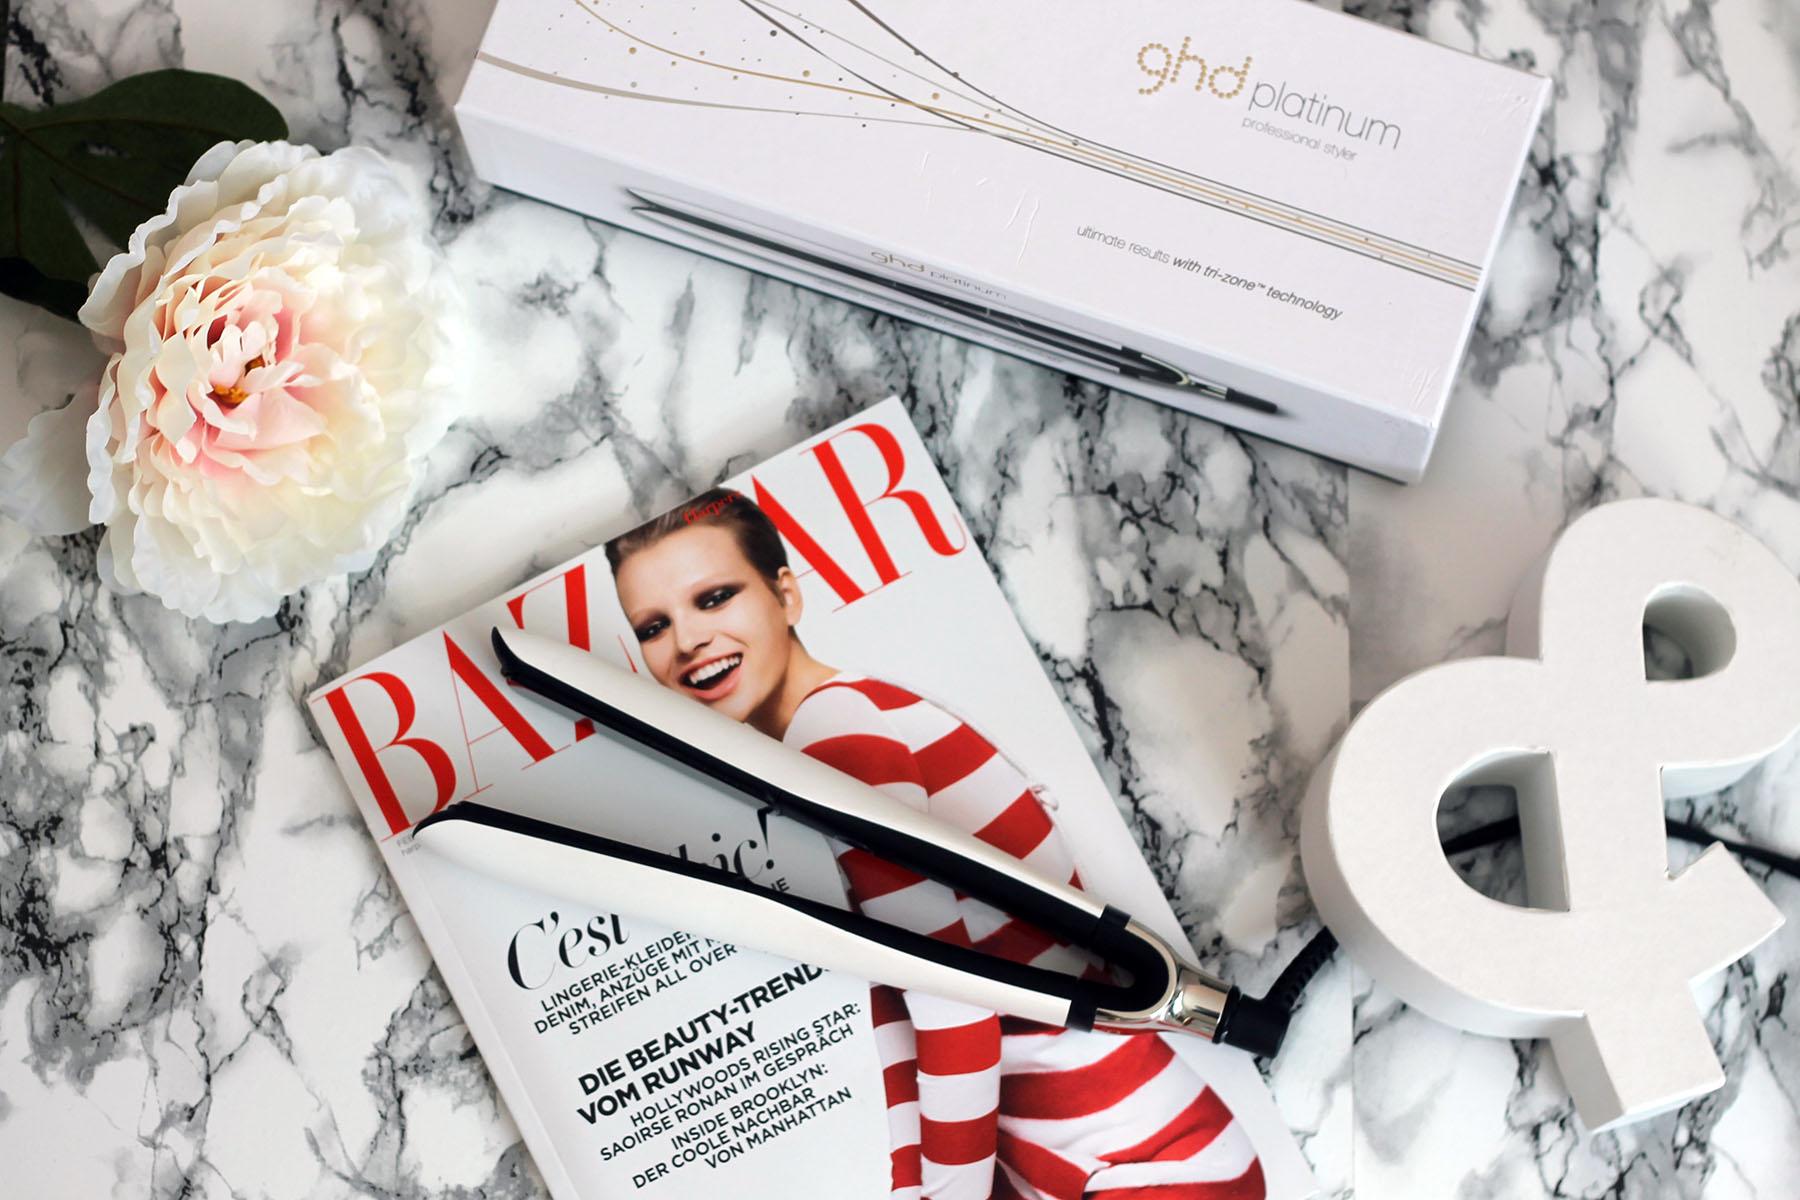 ghd-platinum-style-glätteisen-tutorial-haar-beautyblog-blogger